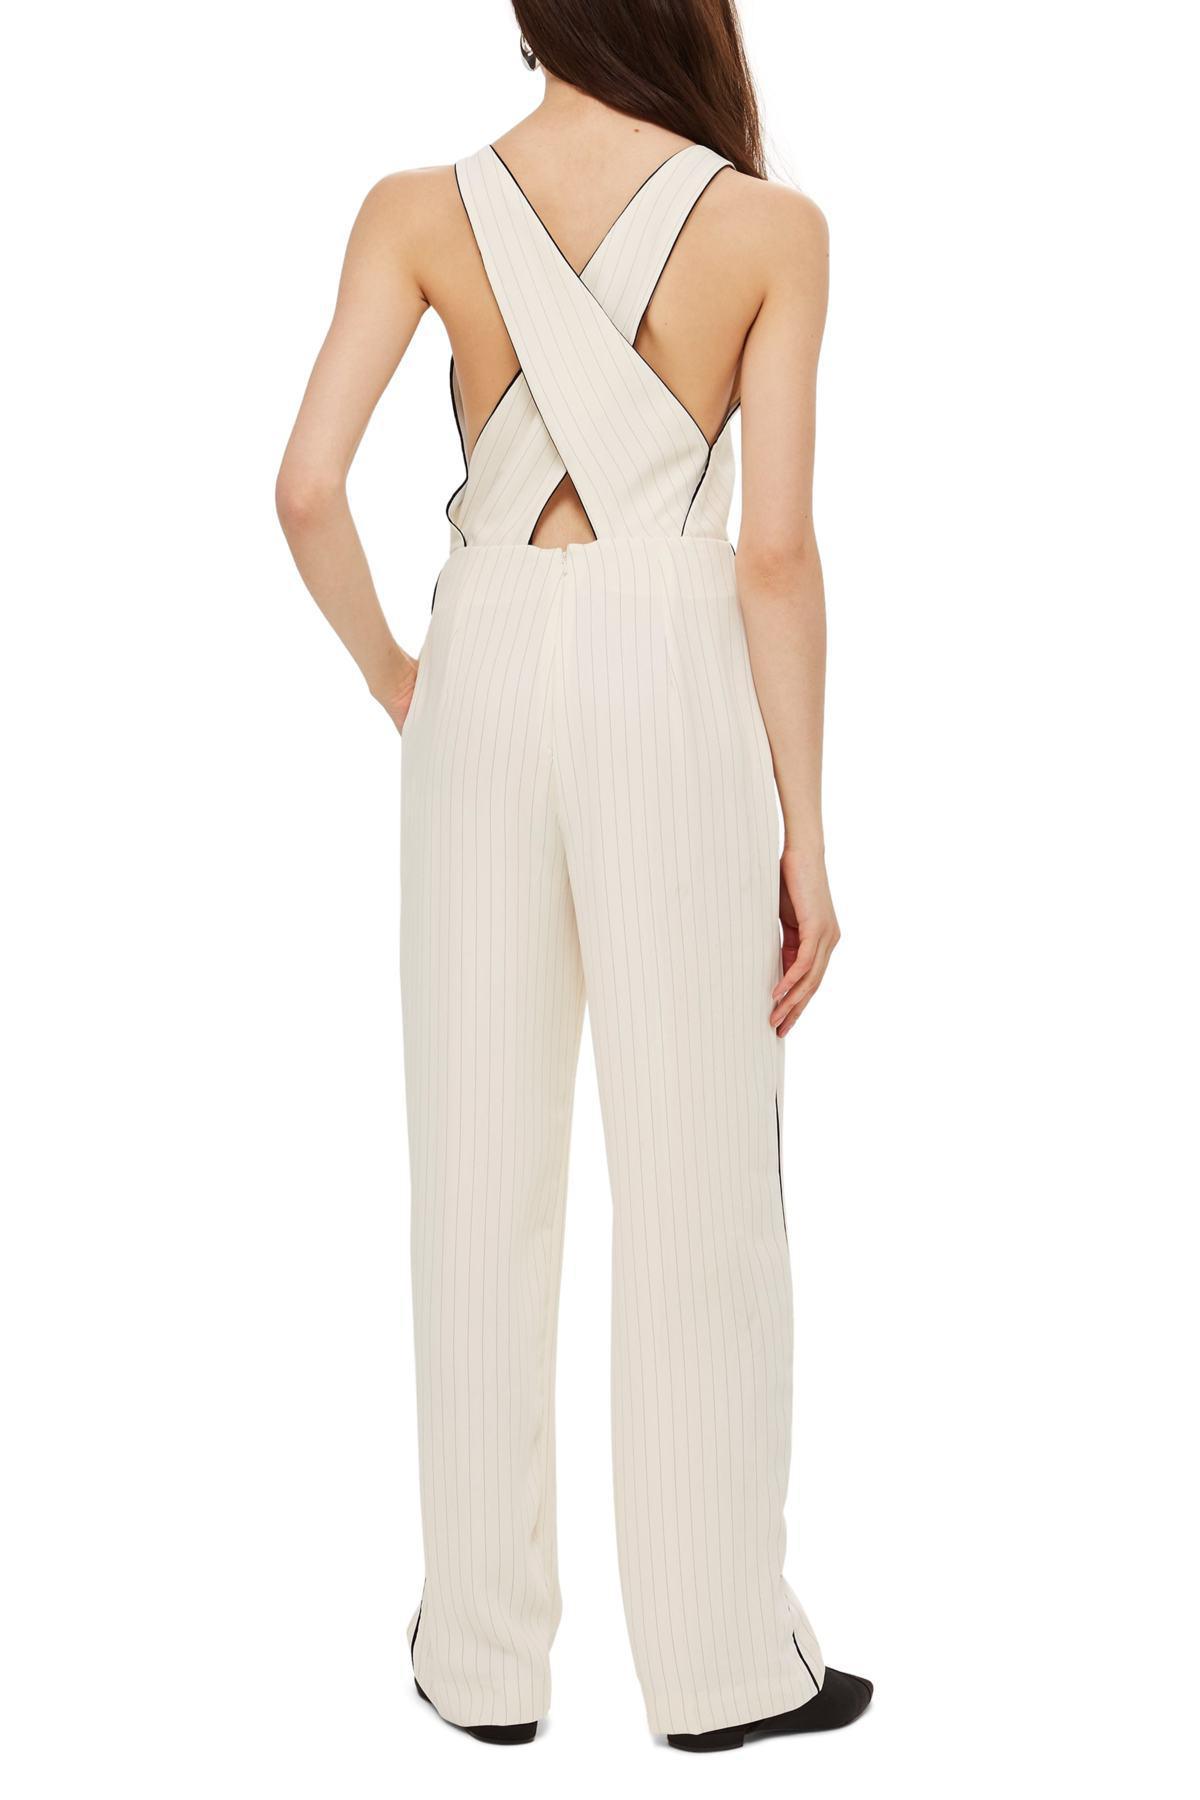 d27e138dab4 TOPSHOP - White Pinstripe Jumpsuit - Lyst. View fullscreen